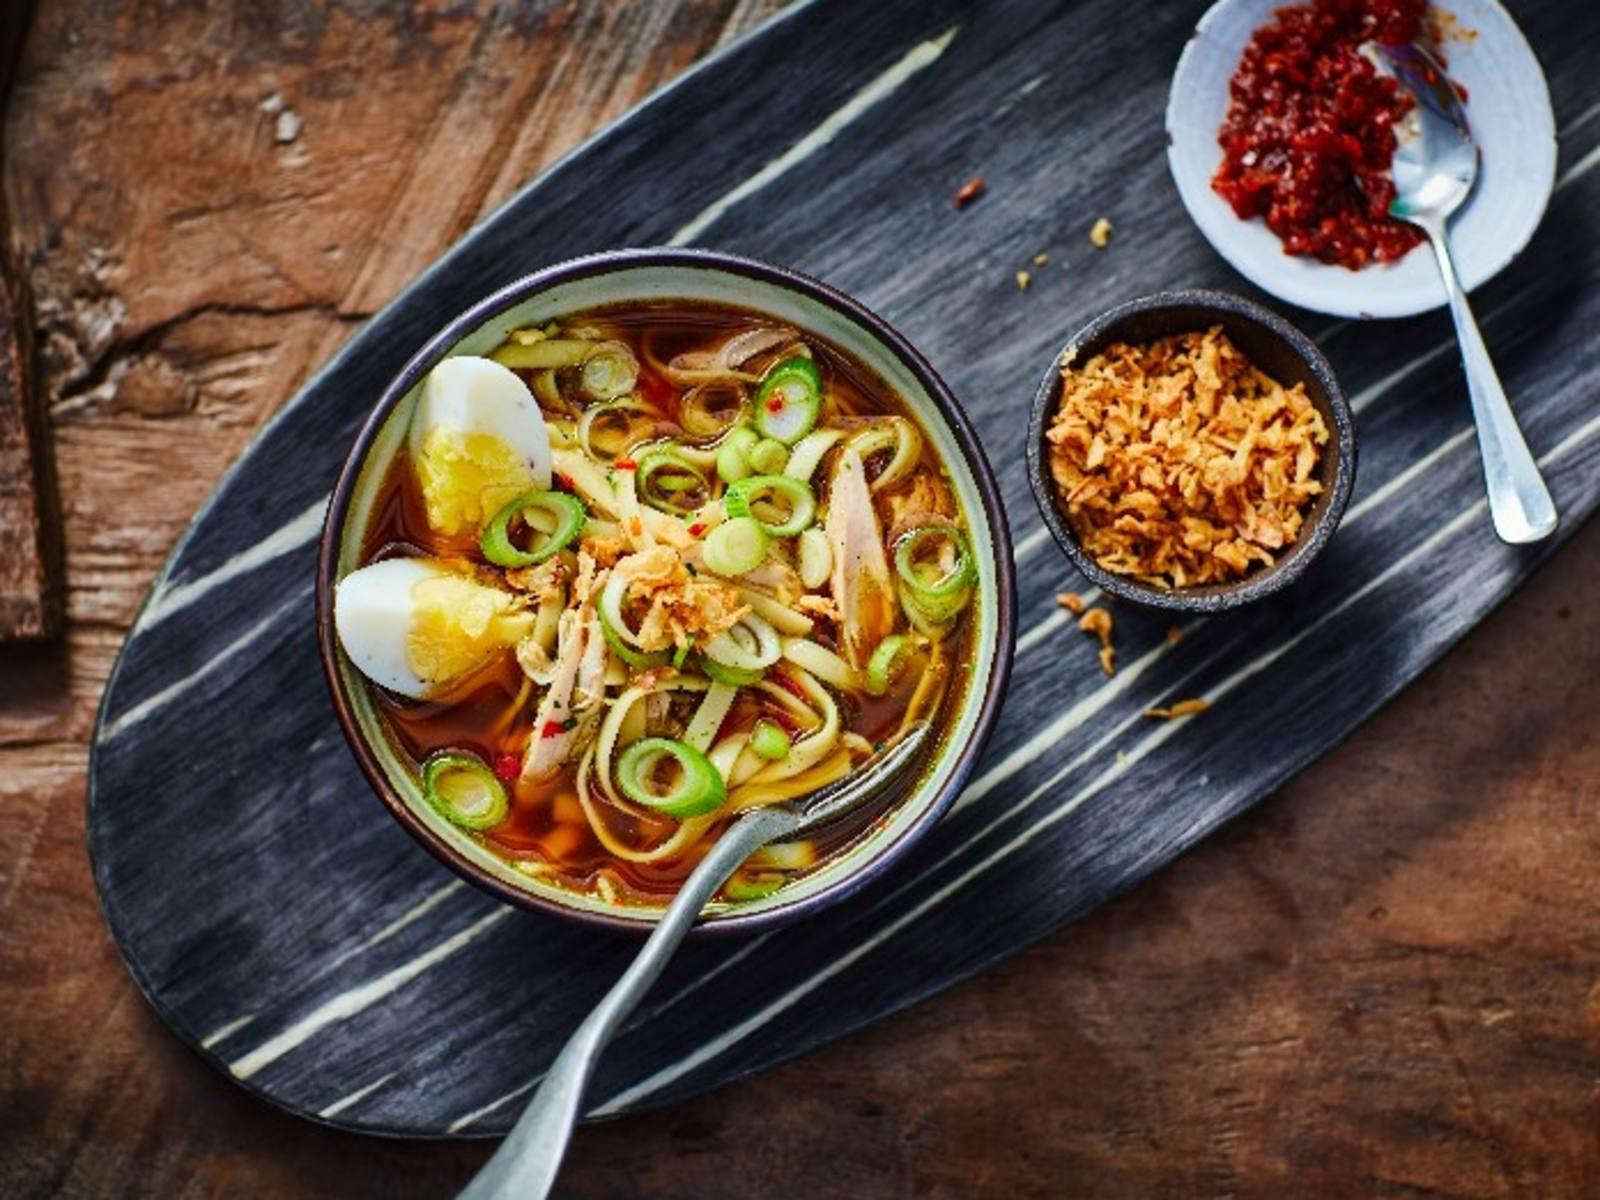 Bami soep (Ramensoep)